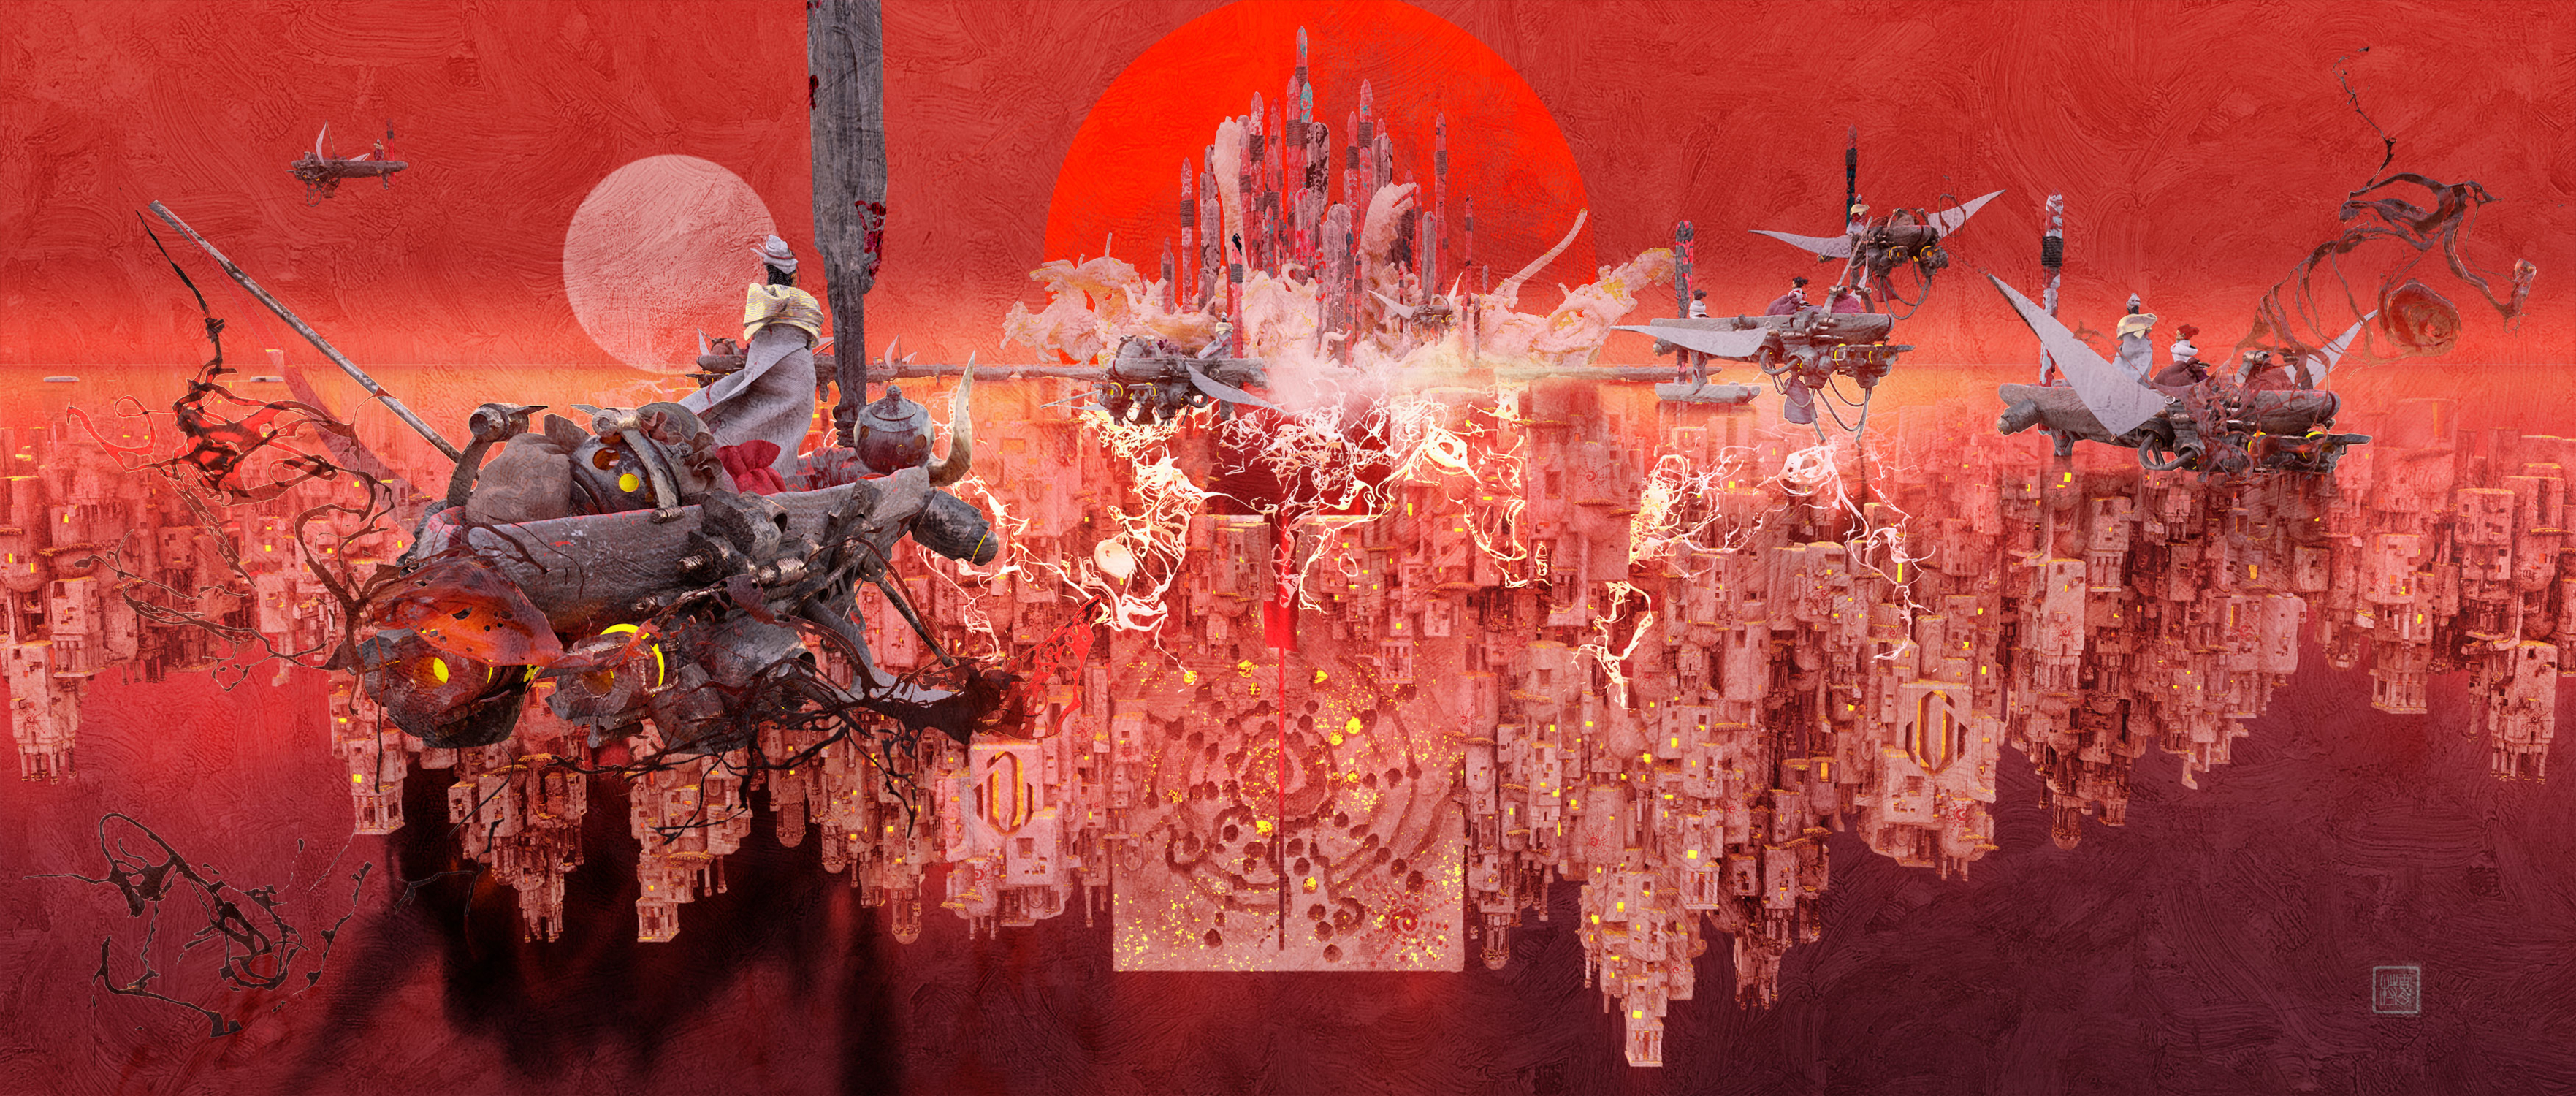 chasing Sun No.2 Artwork by TE HU